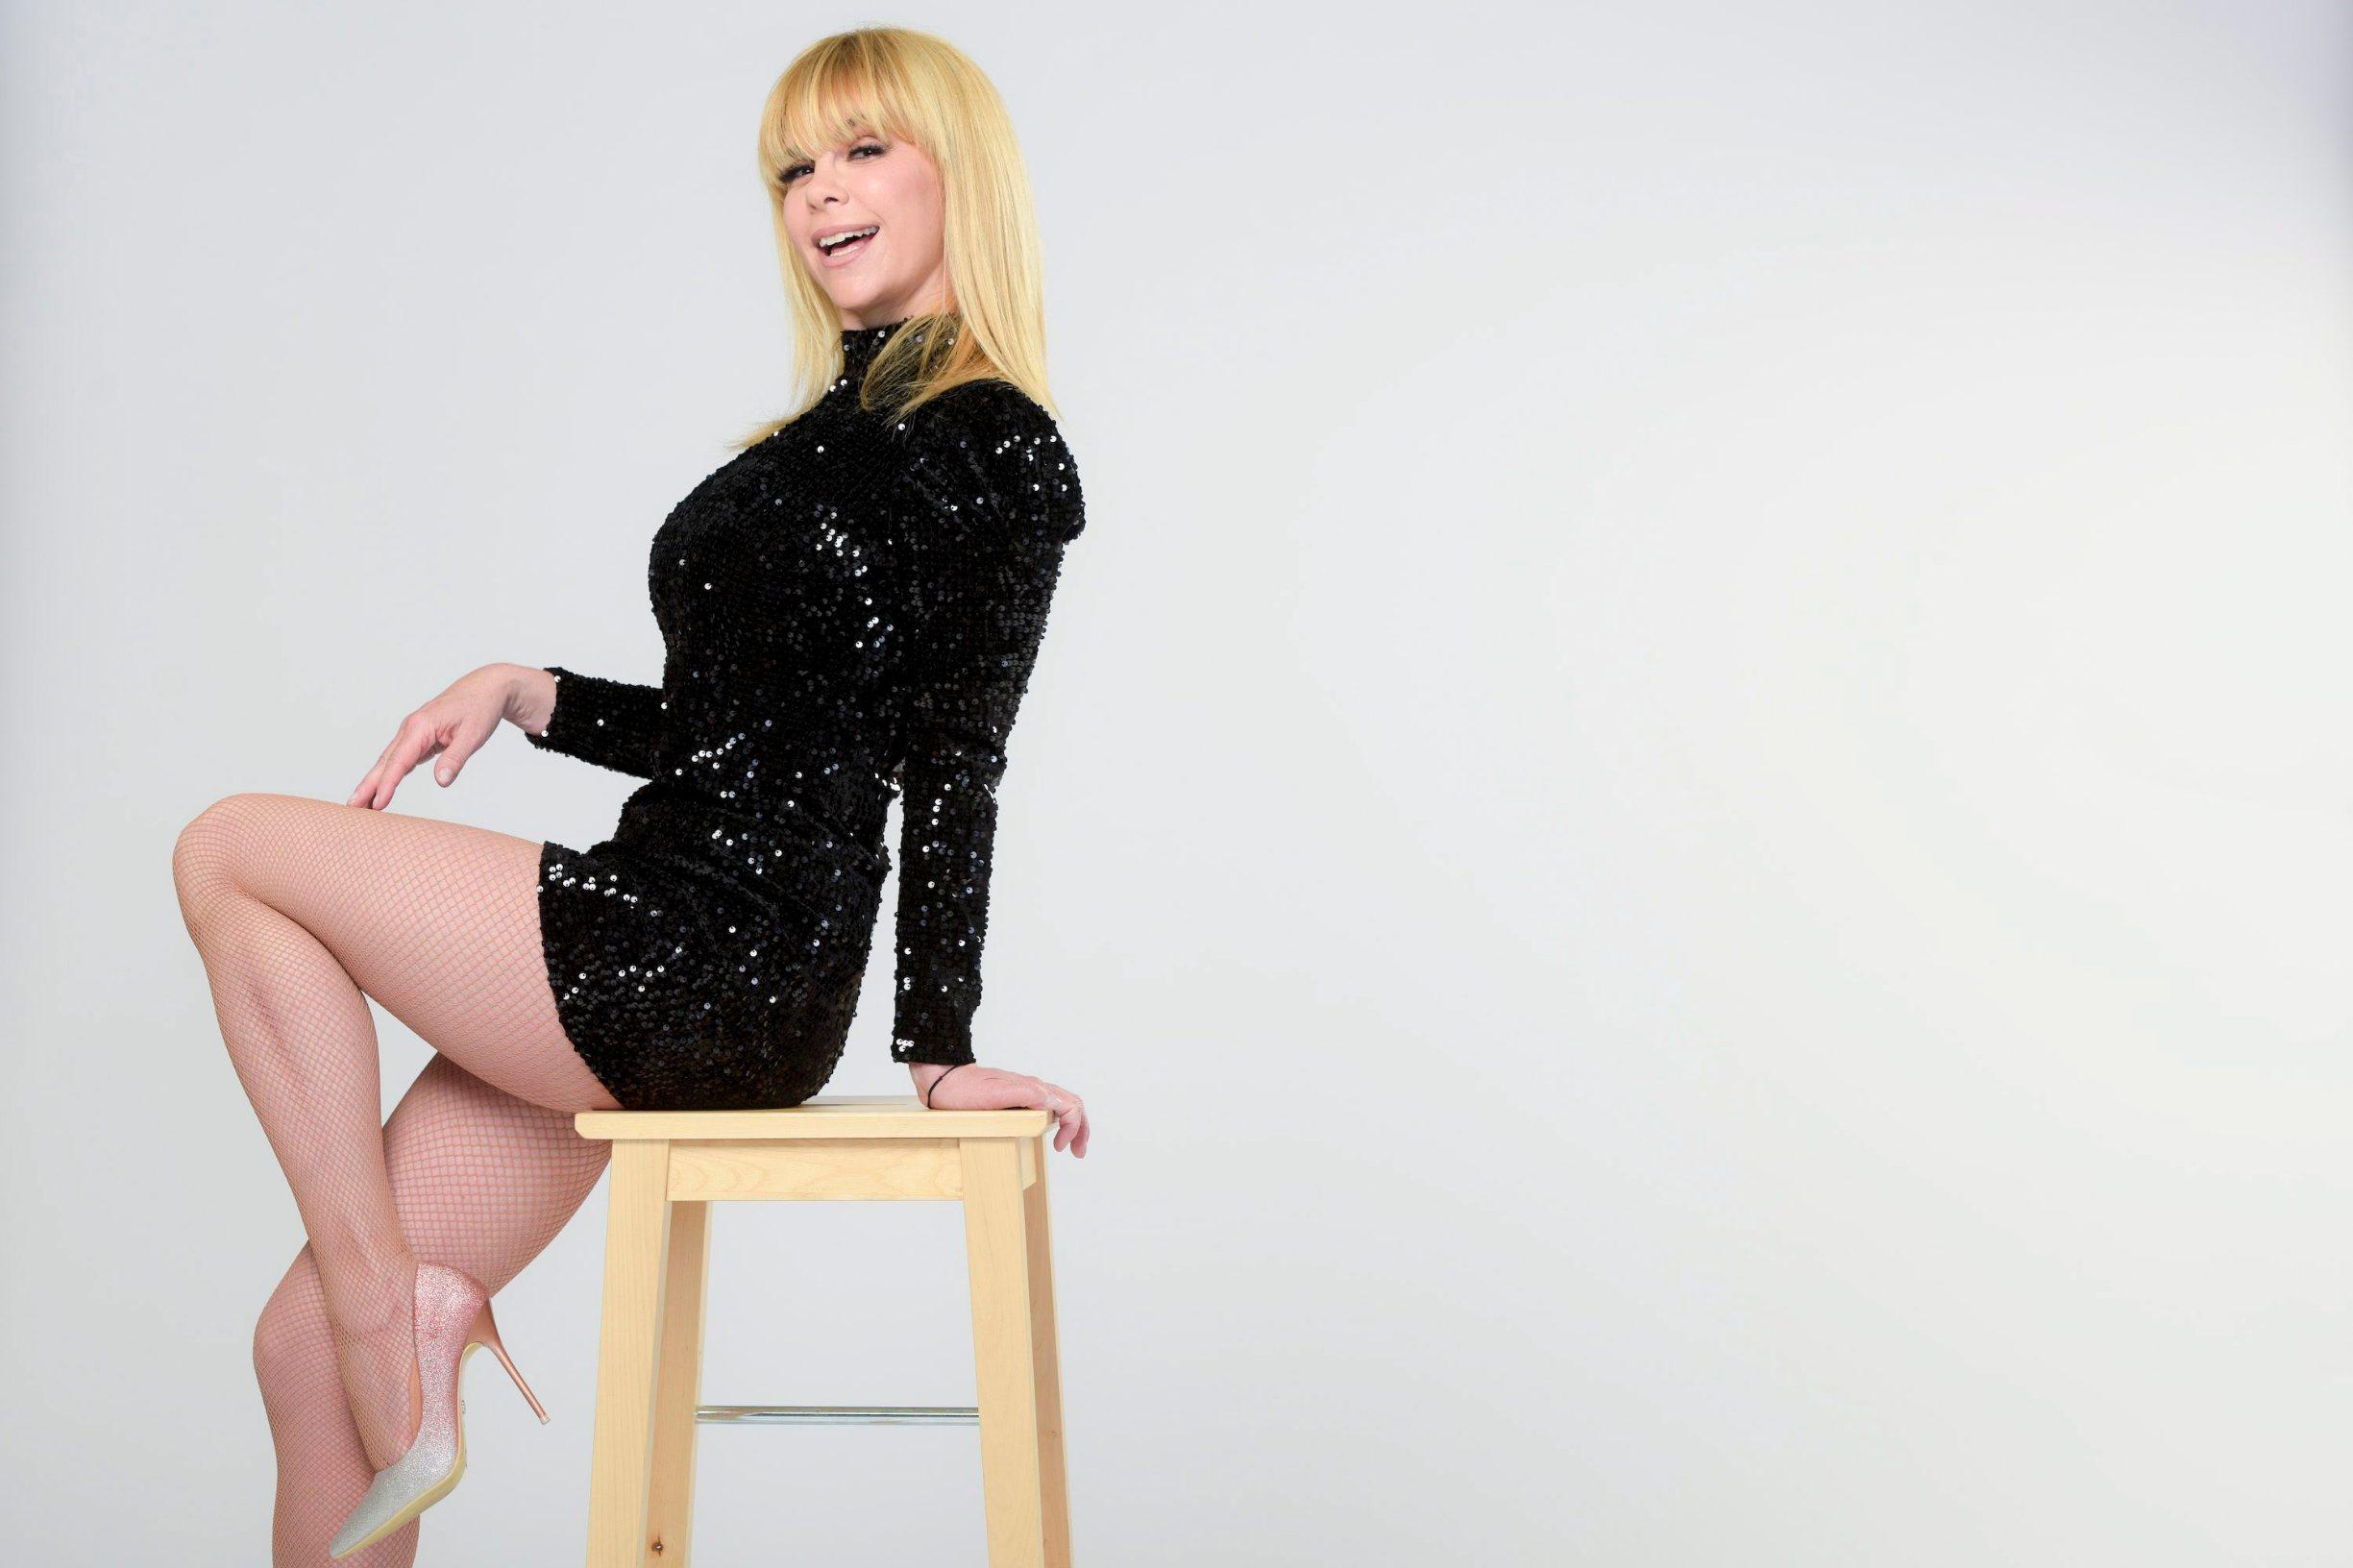 Zagreb, 080419. Koranska 2. Mila Elegovic, filmska i kazalisna glumica. Foto: Darko Tomas / CROPIX